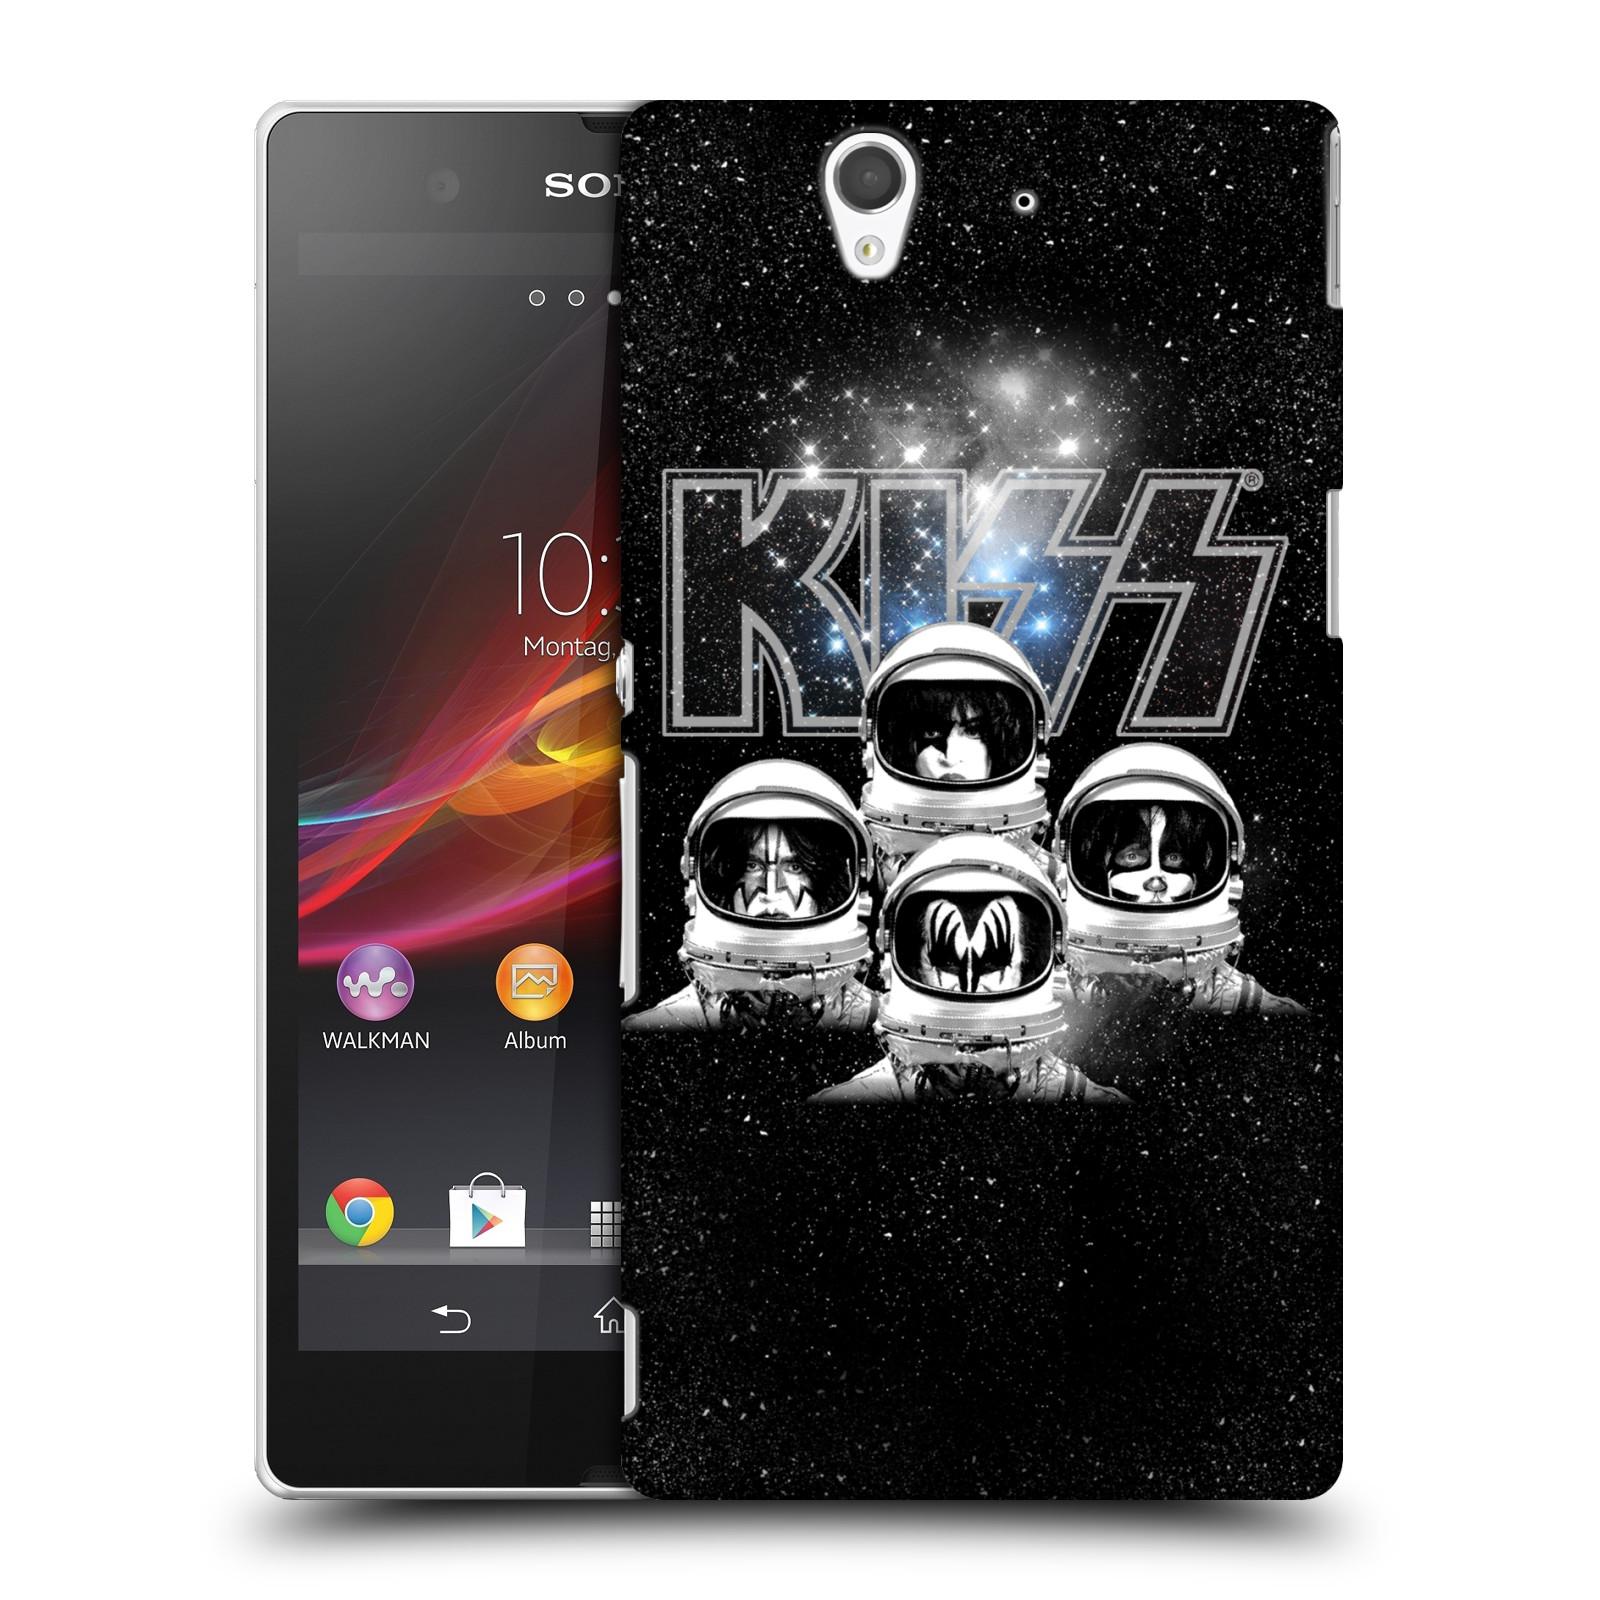 Plastové pouzdro na mobil Sony Xperia Z C6603 HEAD CASE - Kiss - Galactic (Plastový kryt či obal na mobilní telefon s licencovaným motivem Kiss pro Sony Xperia Z)